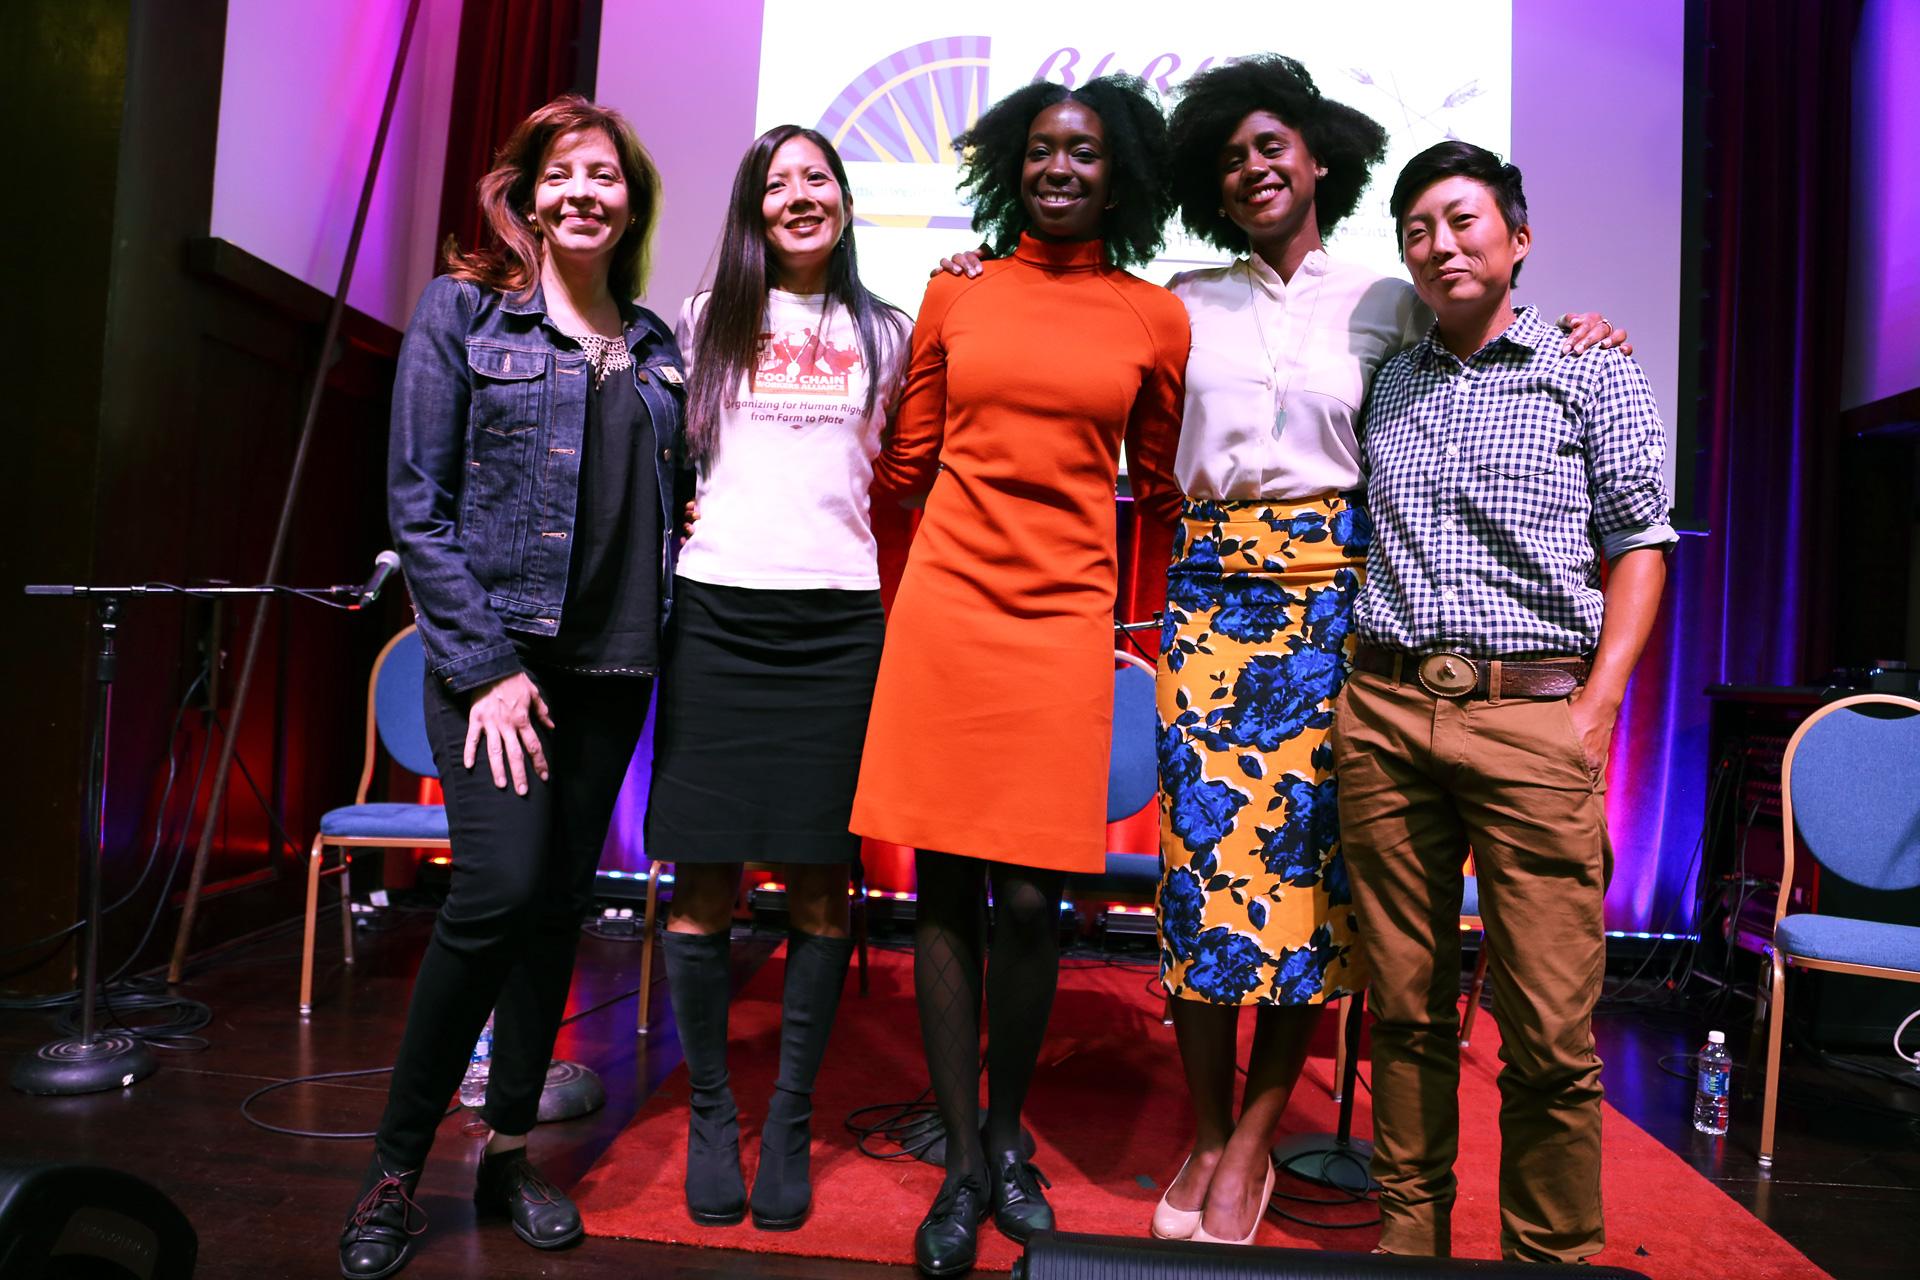 Women Leaders at the Table panel (R to L): Kristyn Leach, Shakirah Simley, Brittni Chicuata, Joann Lo, Dominica Rice Cisneros